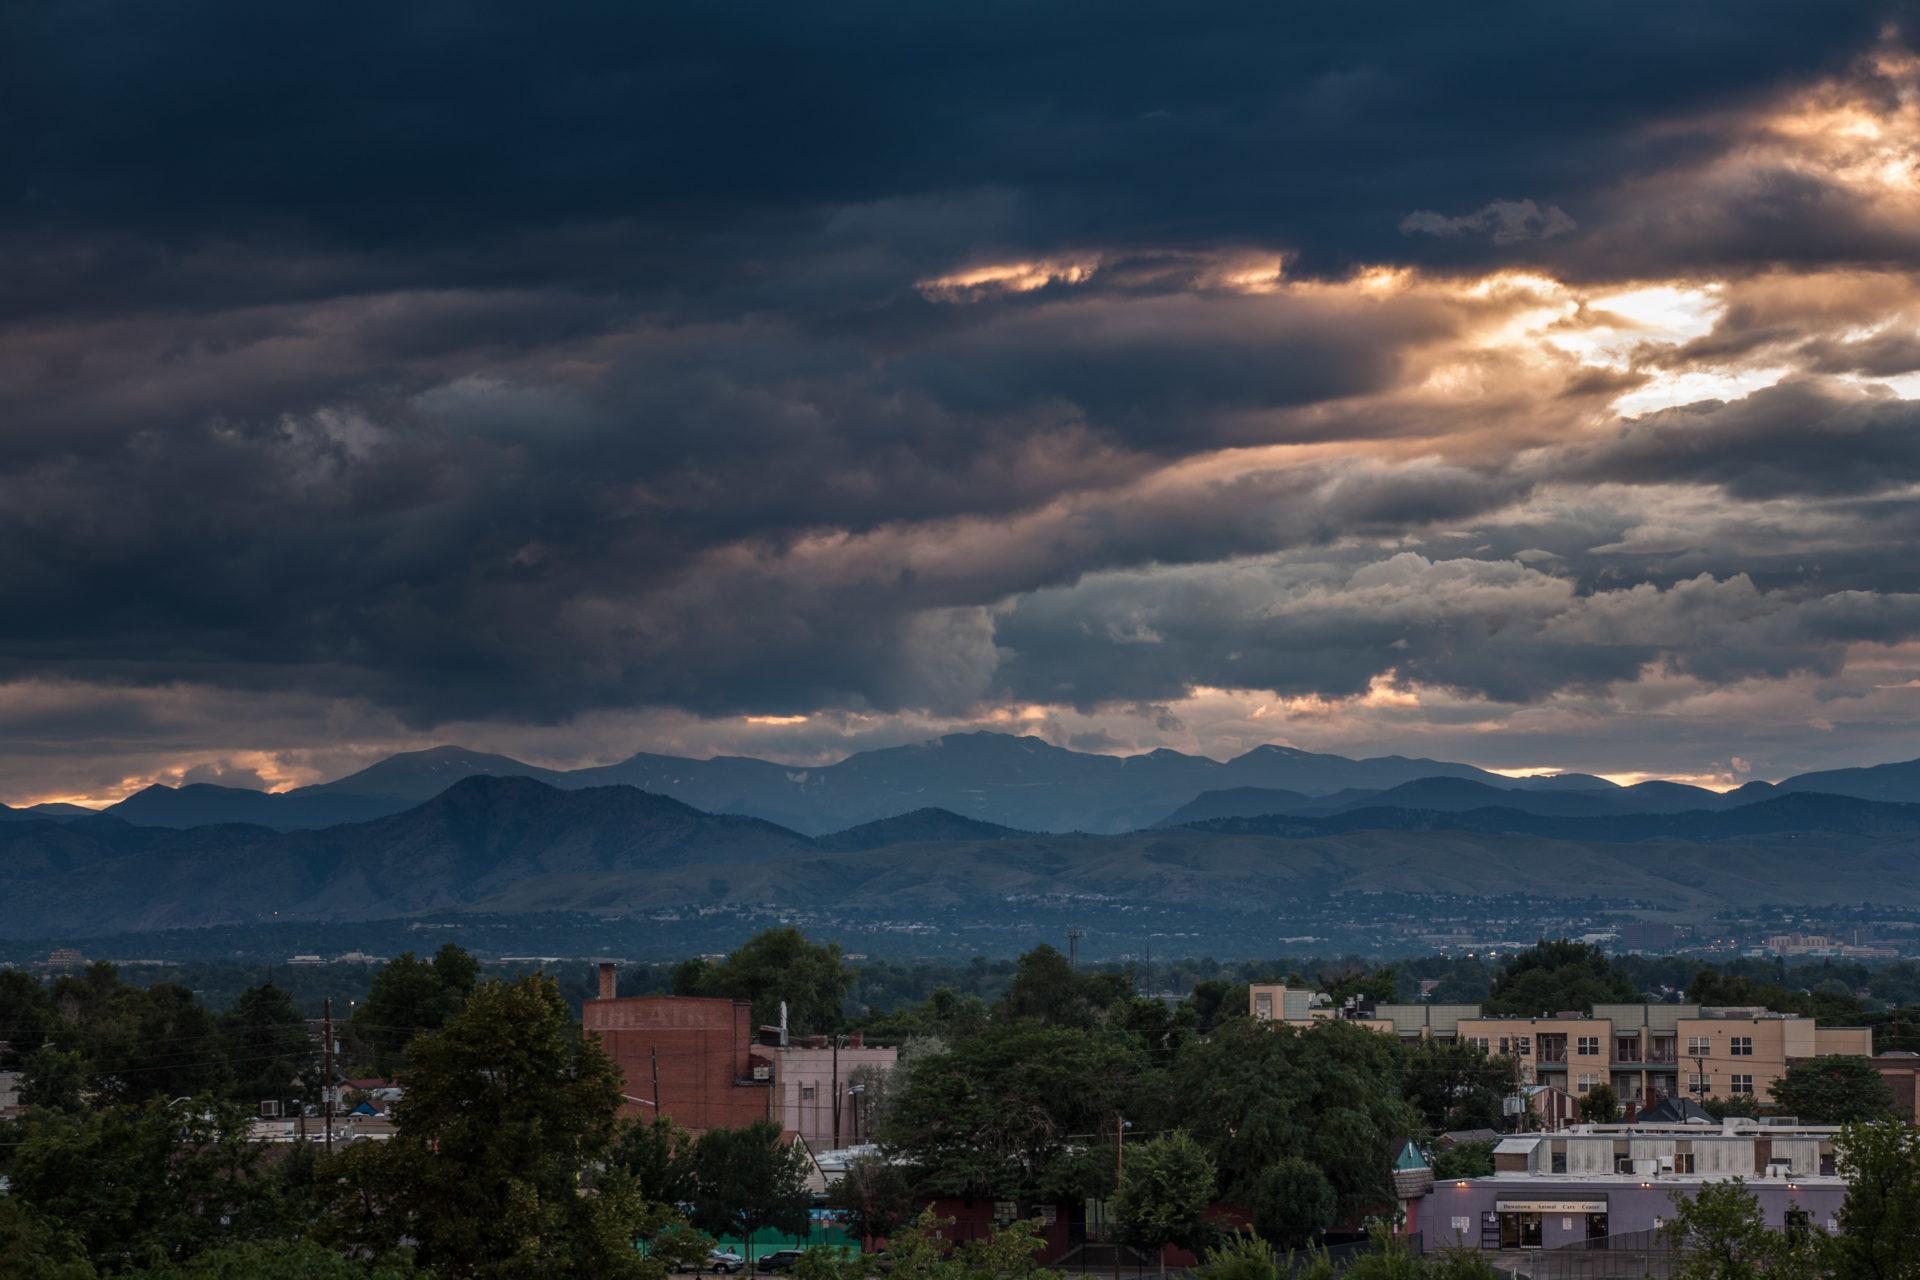 Mount Evans sunset - August 1, 2011